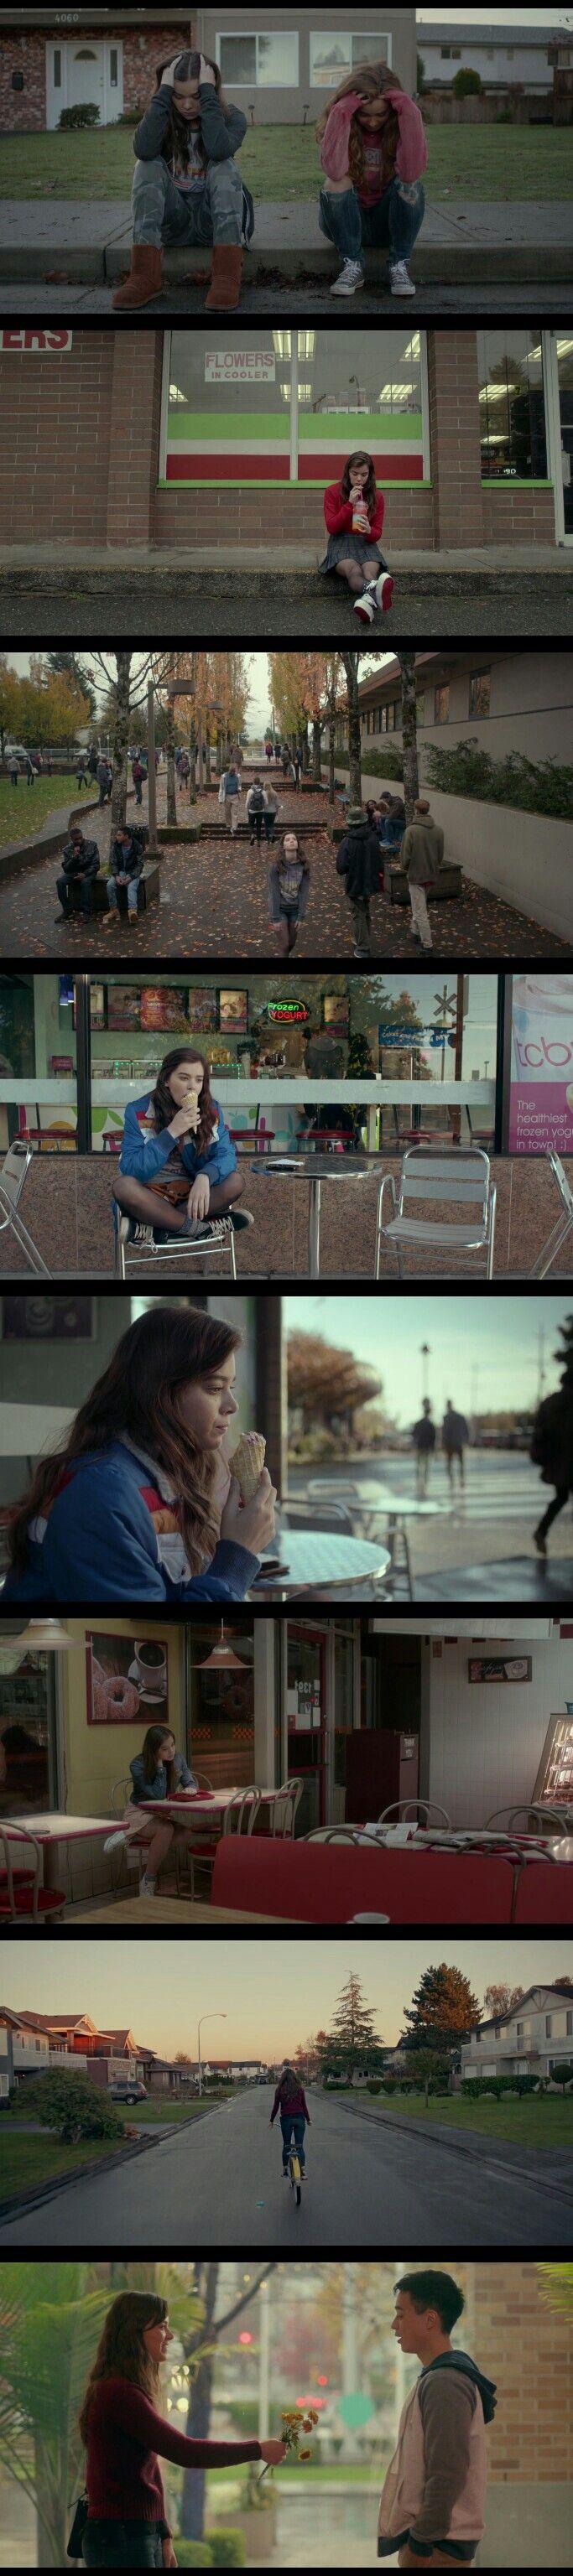 Hailee Steinfeld in The Edge of Seventeen as Seventeen years old high school girl Nadine Franklin.